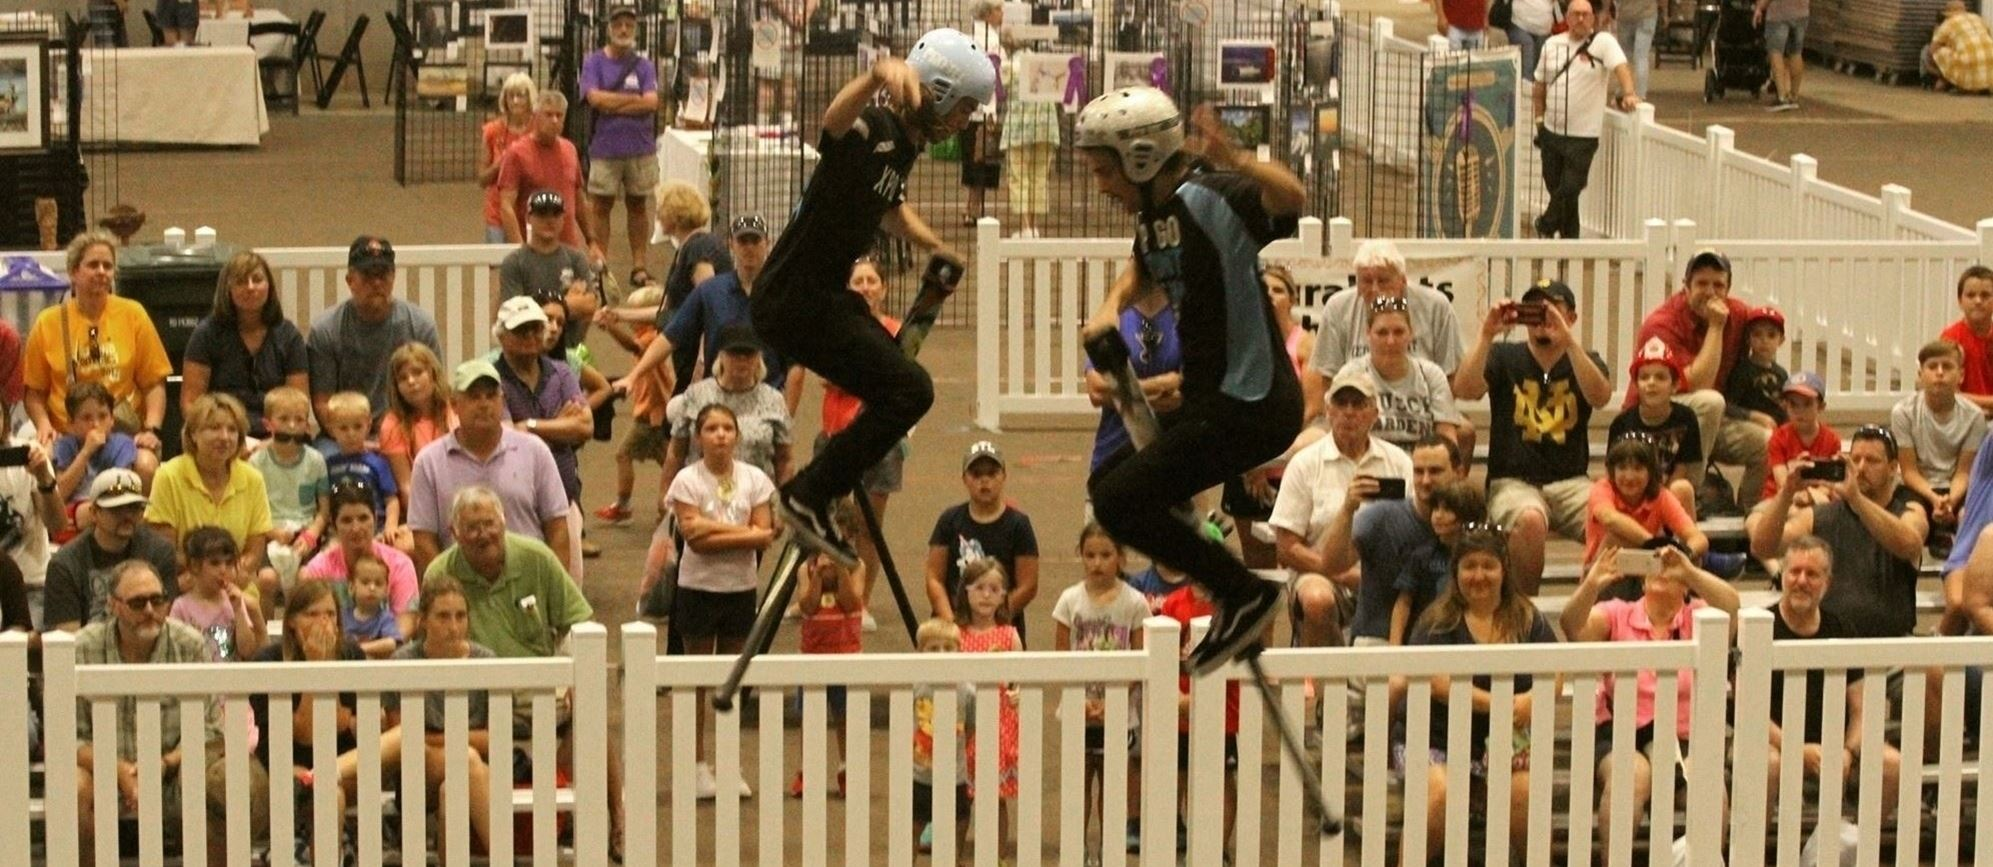 Xpogo stunt team performs at the 2019 Williamson County Fair